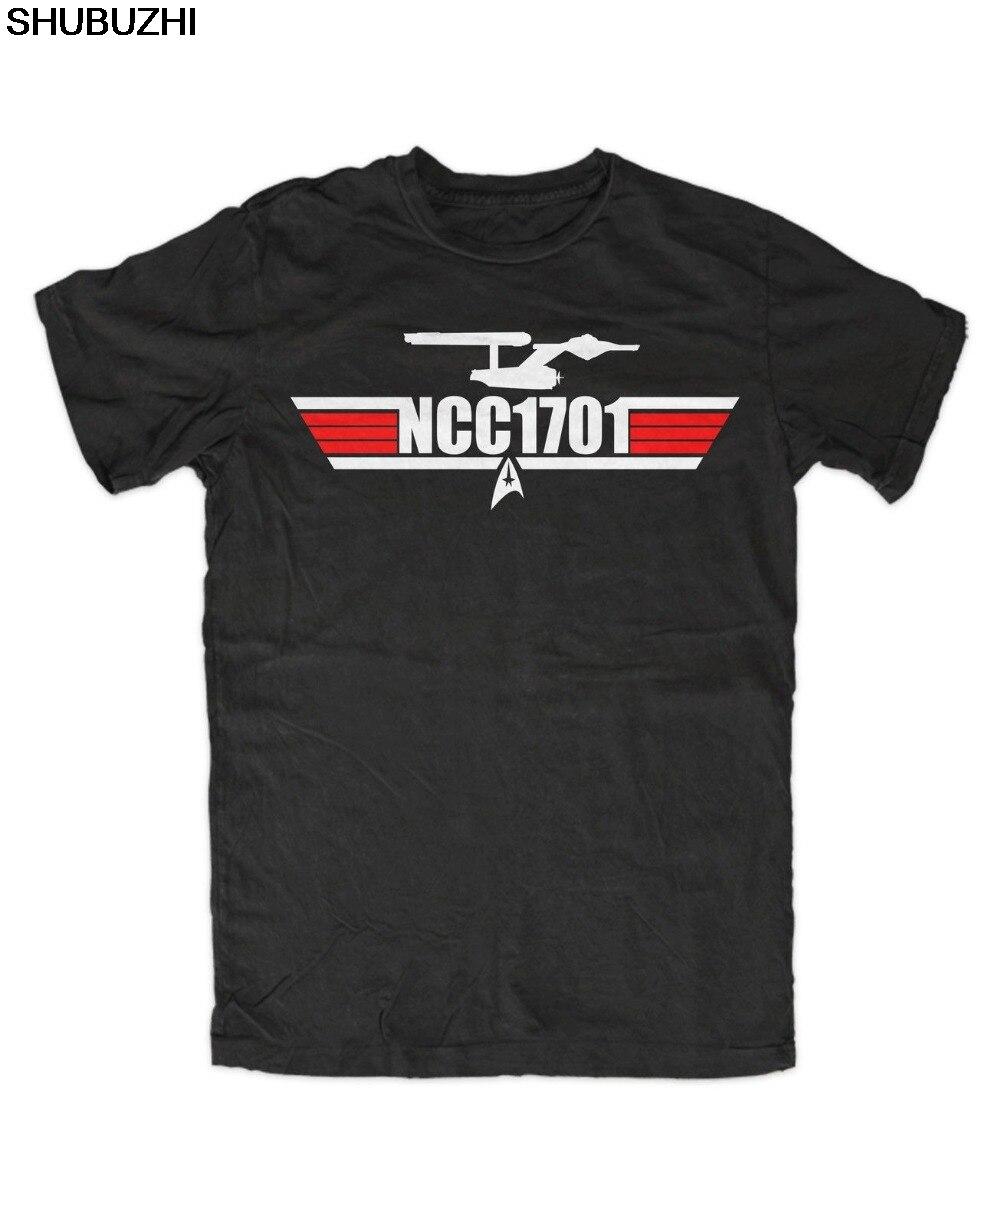 Летняя стильная модная NCC-1701 футболка со звездами, Kult, Fun, Spock, Movie, Tv, Kirk, Picard, Uhura, Crusher